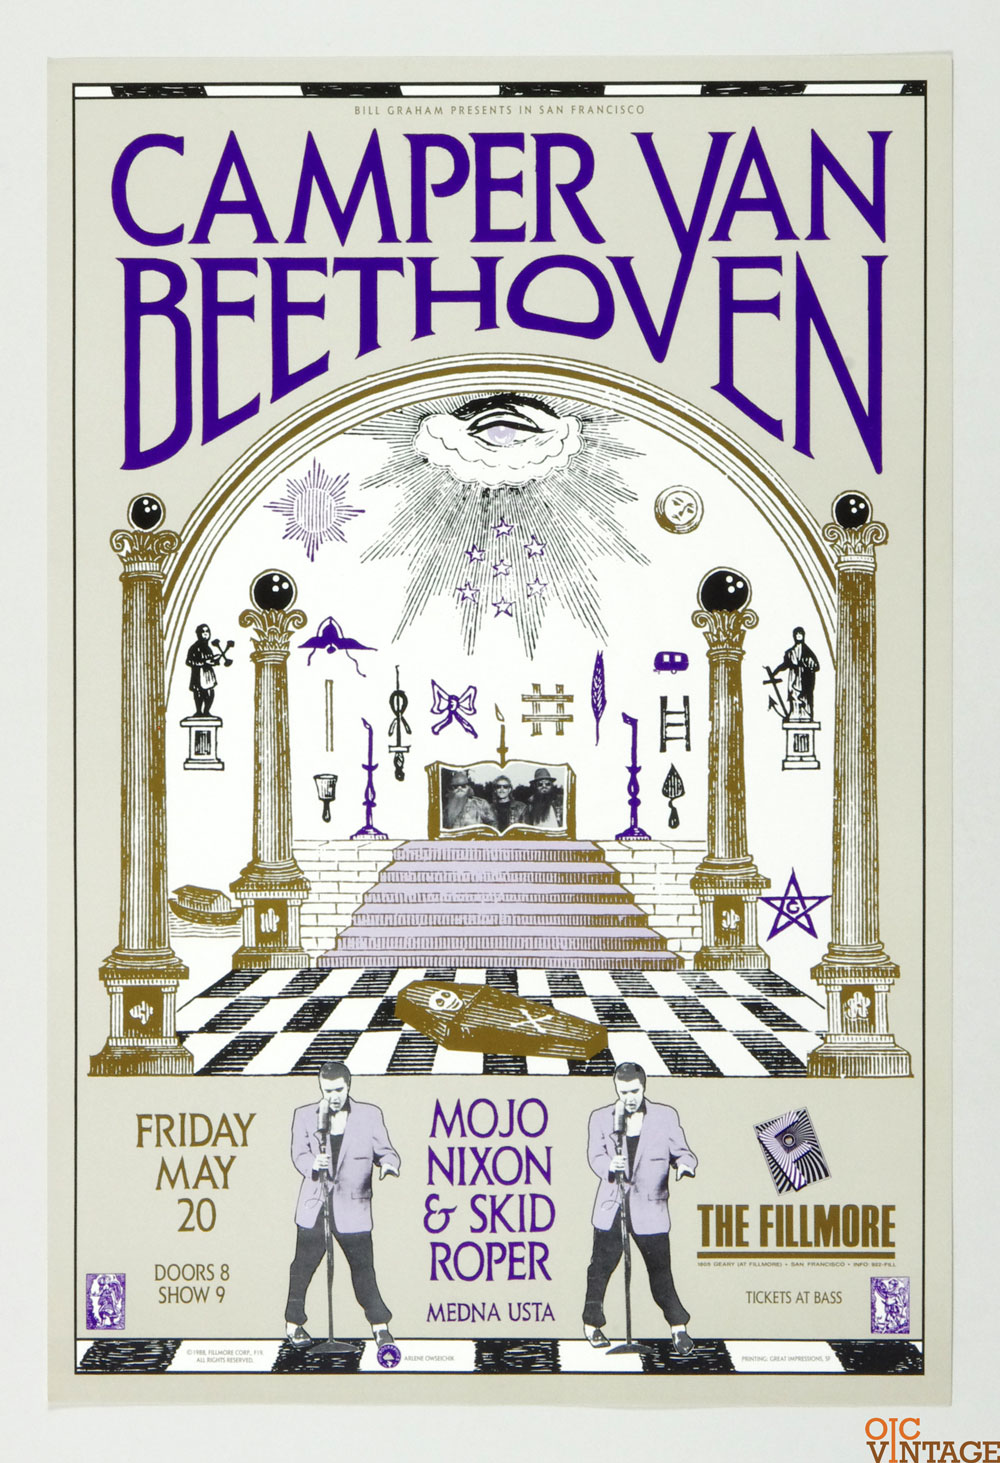 New Fillmore F019 Poster Camper Van Beethoven Mojo Nixon & Skid Roper 1988 May 20